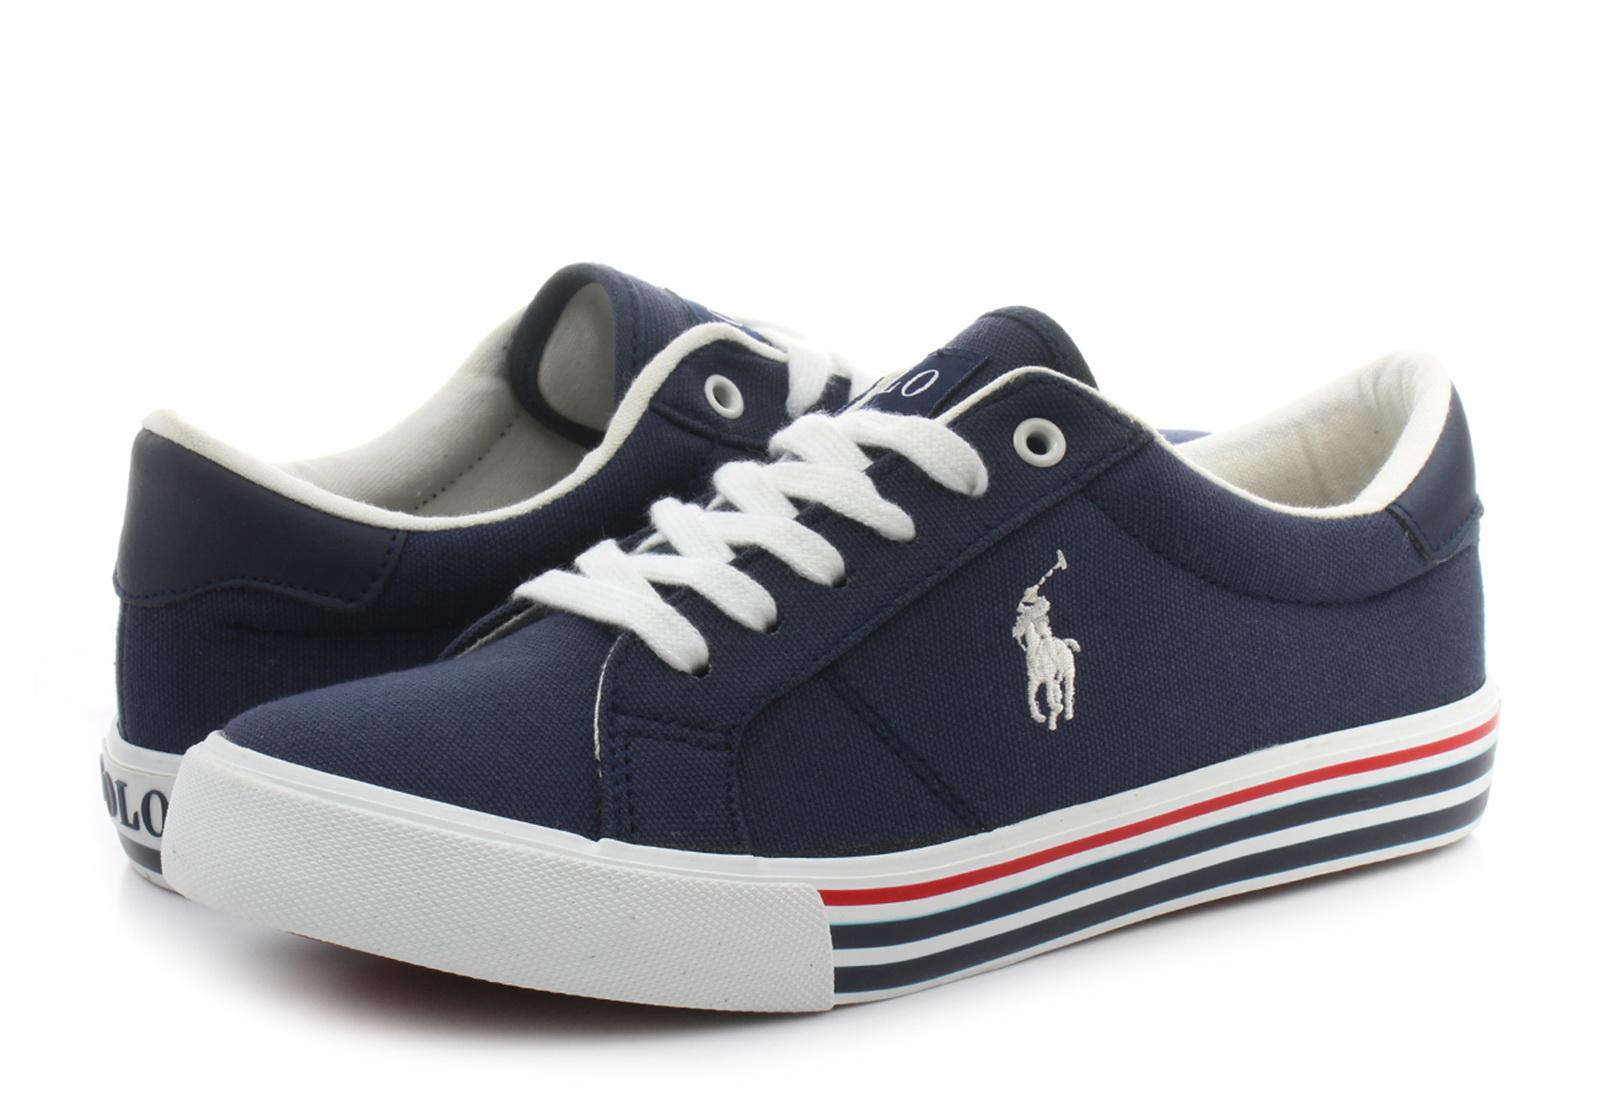 a24bb98ea8 Polo Ralph Lauren Półbuty - Edgewood - RF101546-J - Obuwie i buty ...